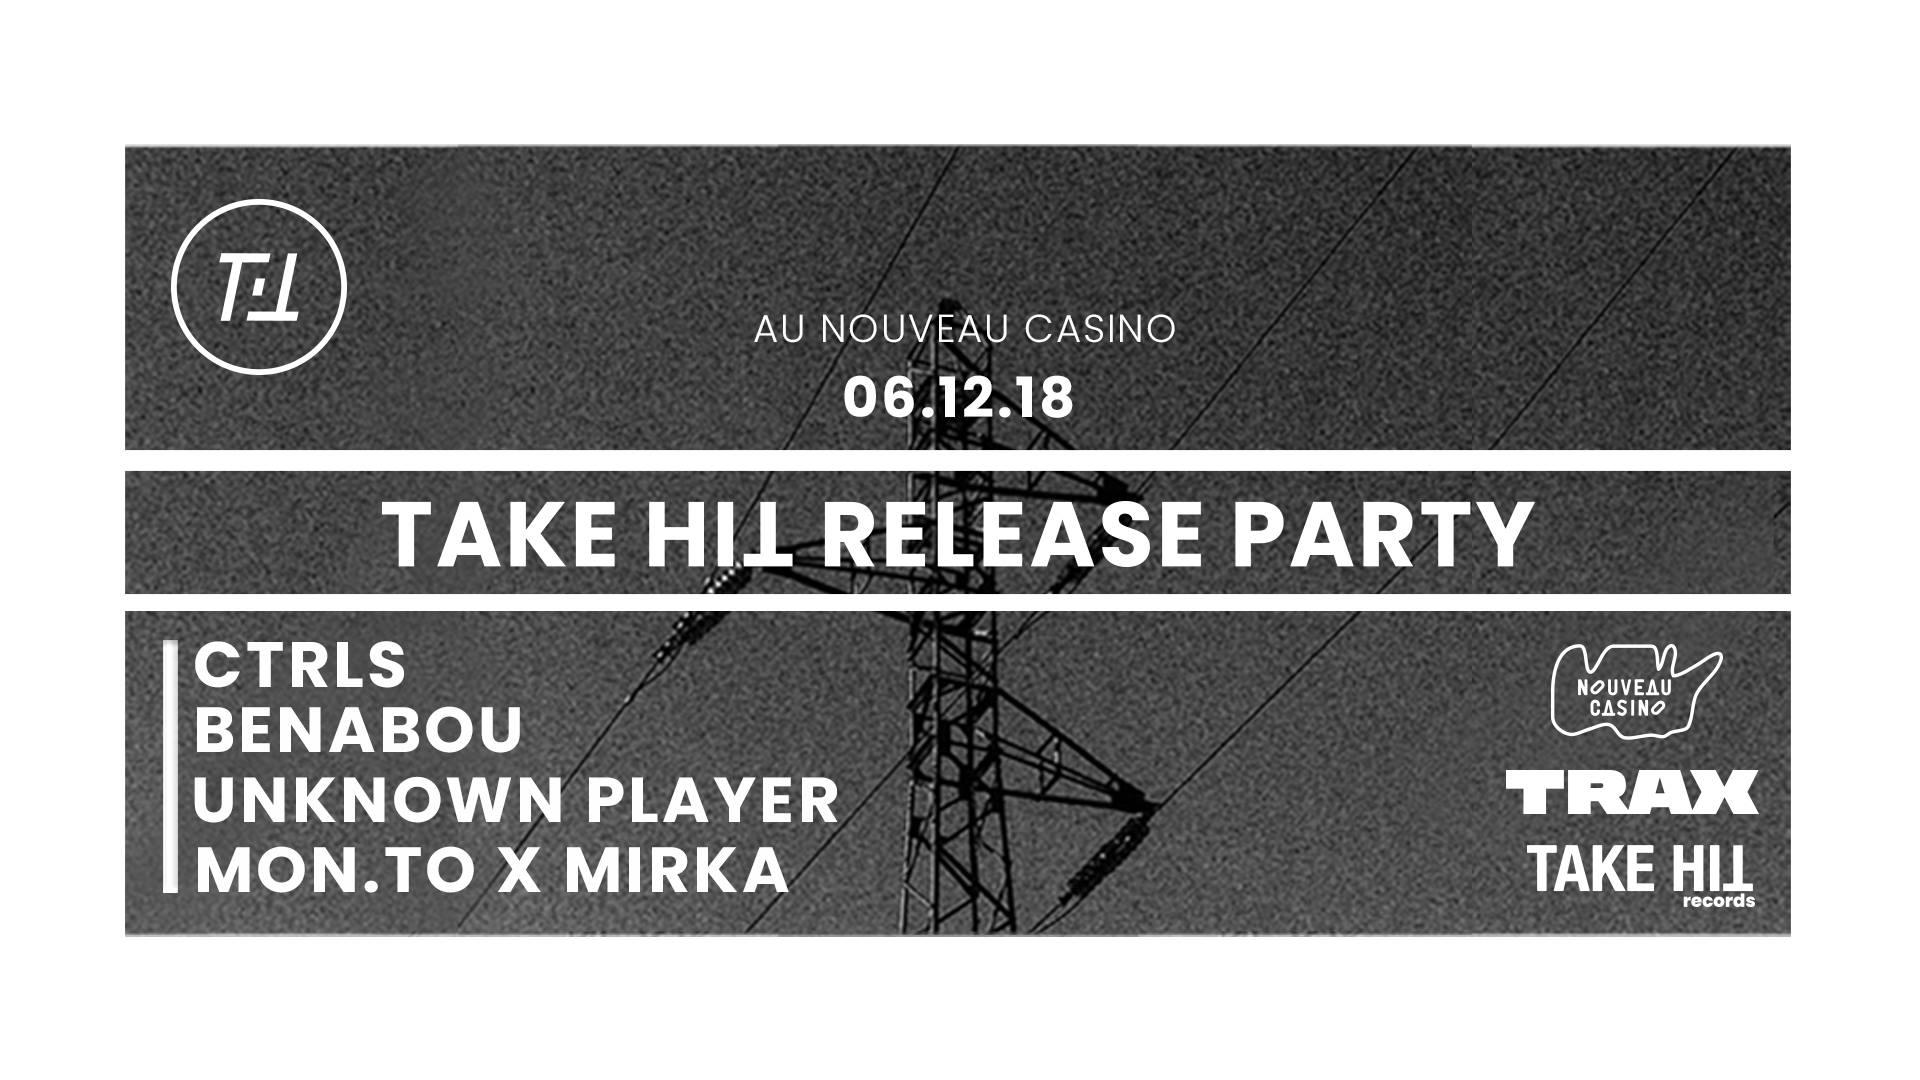 Take Hit release party / Benabou, CTRLS, Unknown player, Mon.To